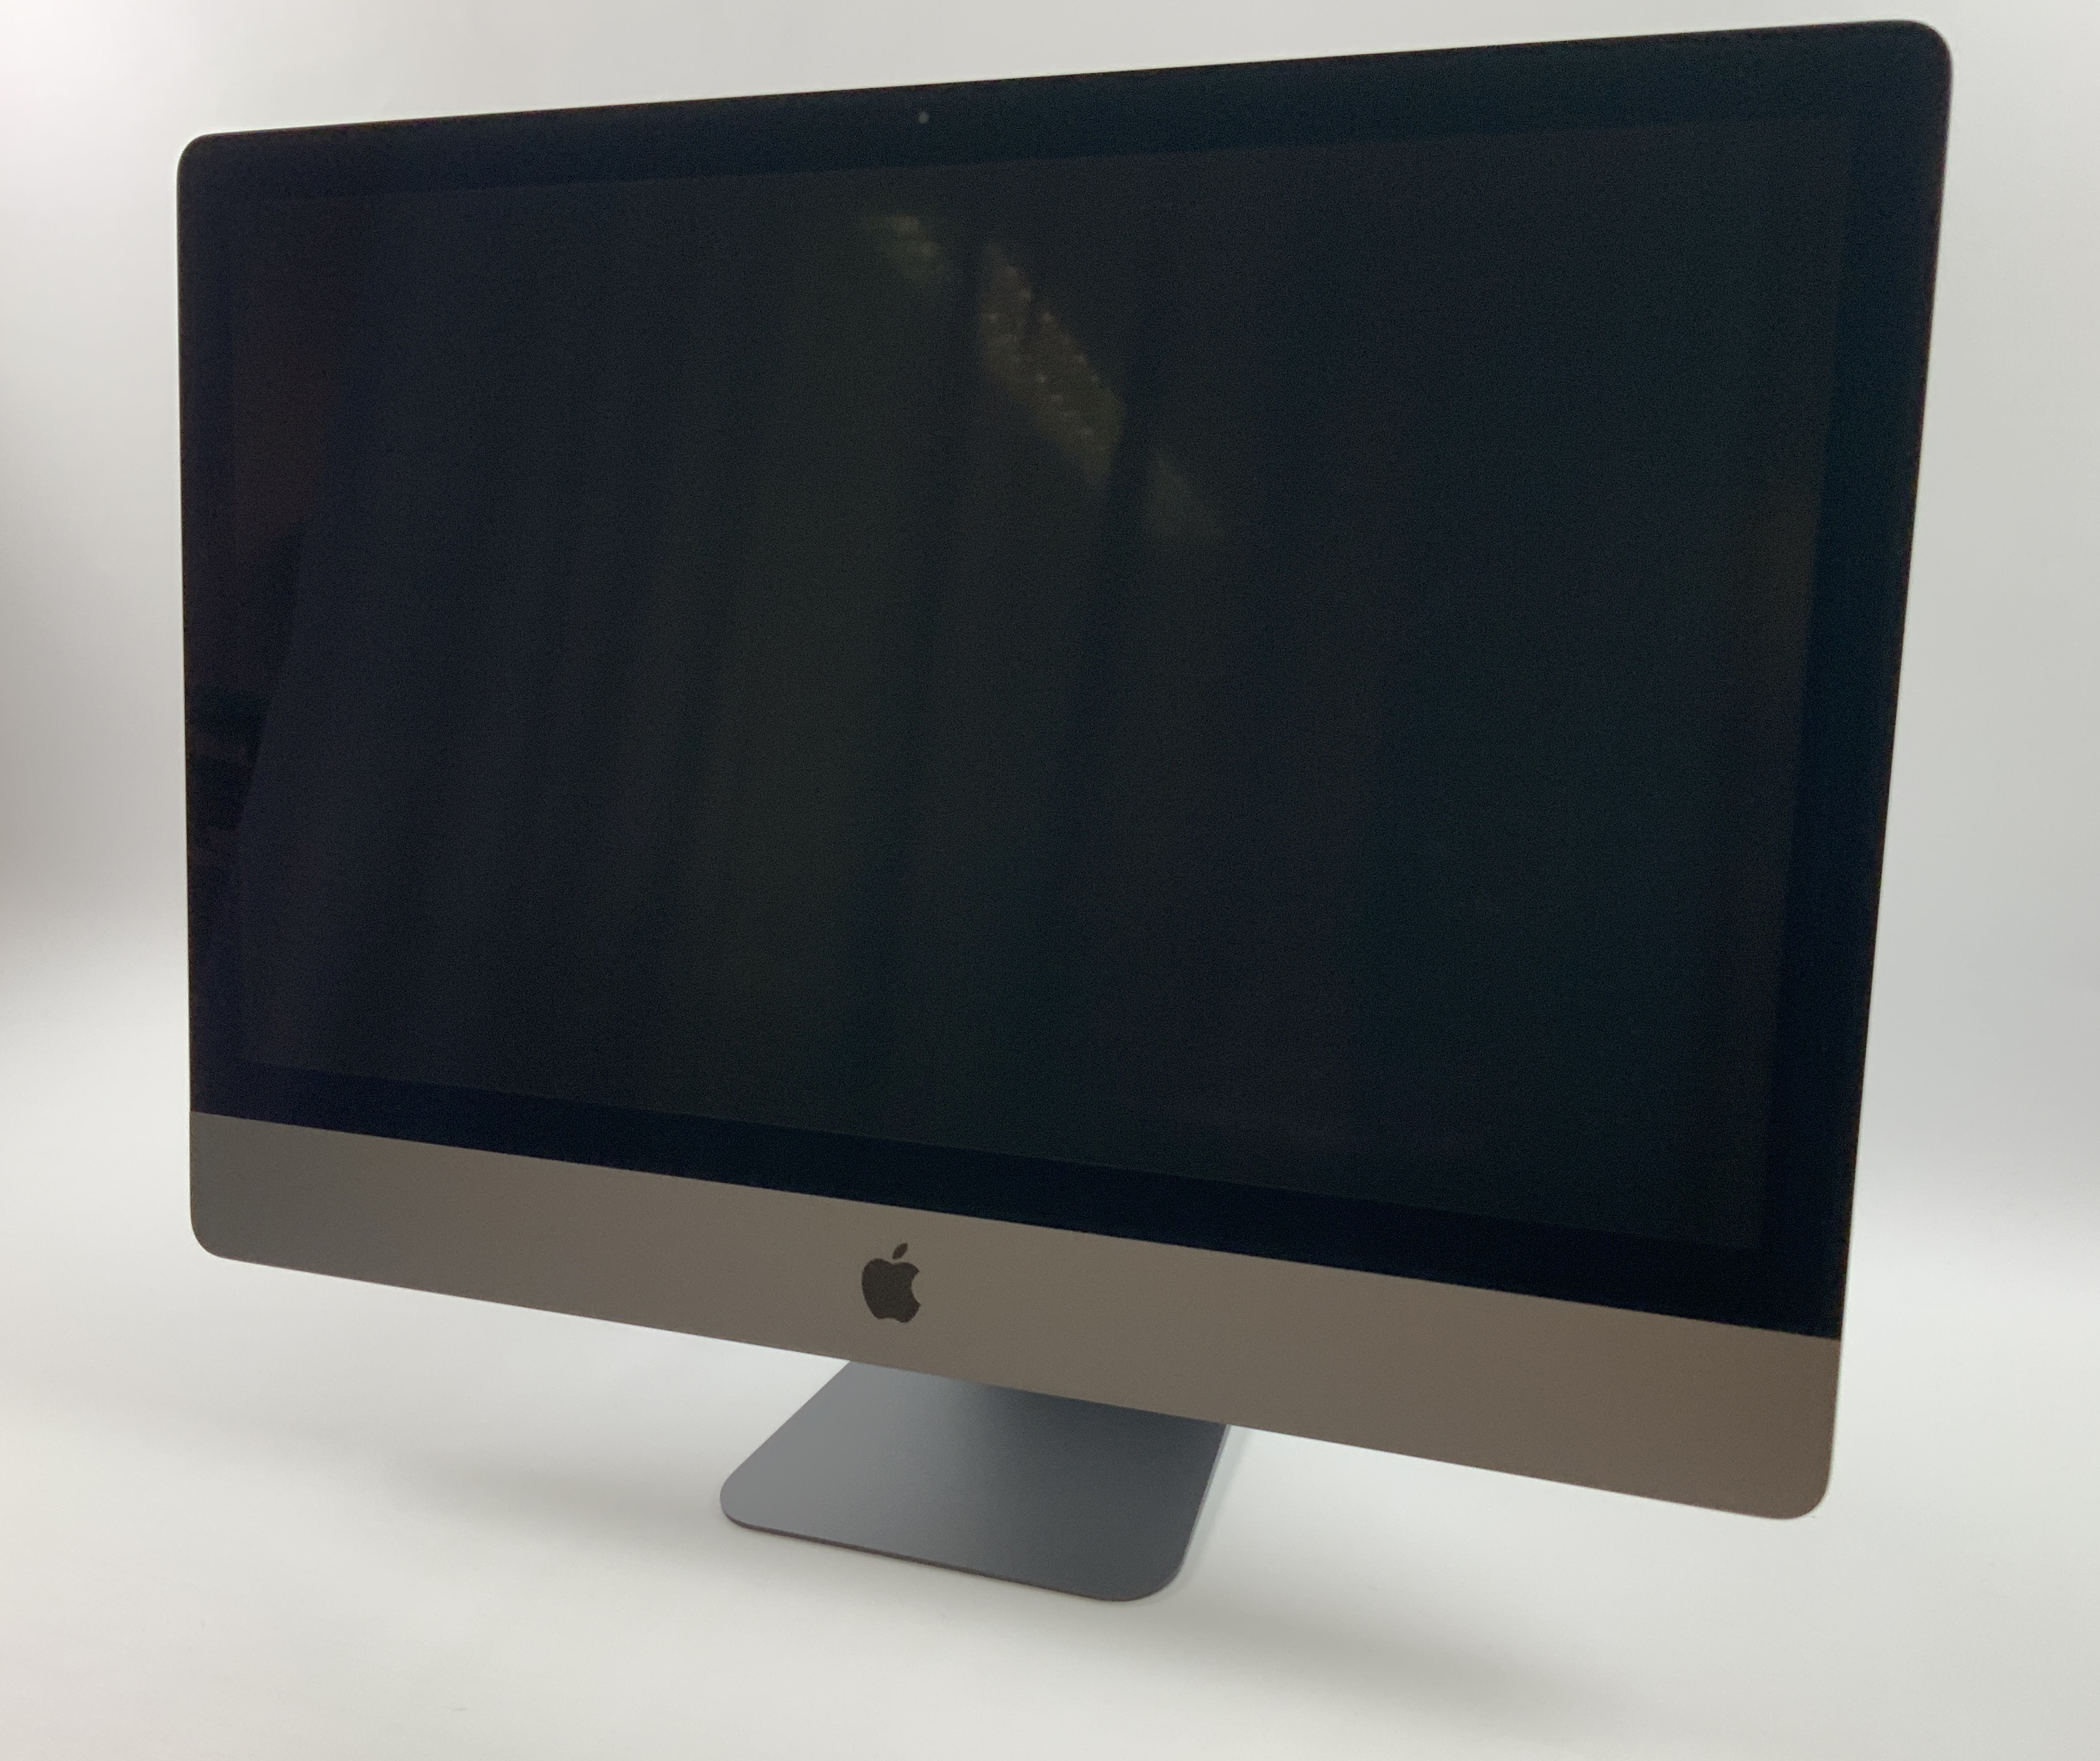 iMac Pro 2017 (Intel 8-Core Xeon W 3.2 GHz 32 GB RAM 1 TB SSD), Intel 8-Core Xeon W 3.2 GHz, 32 GB RAM, 1 TB SSD, imagen 1